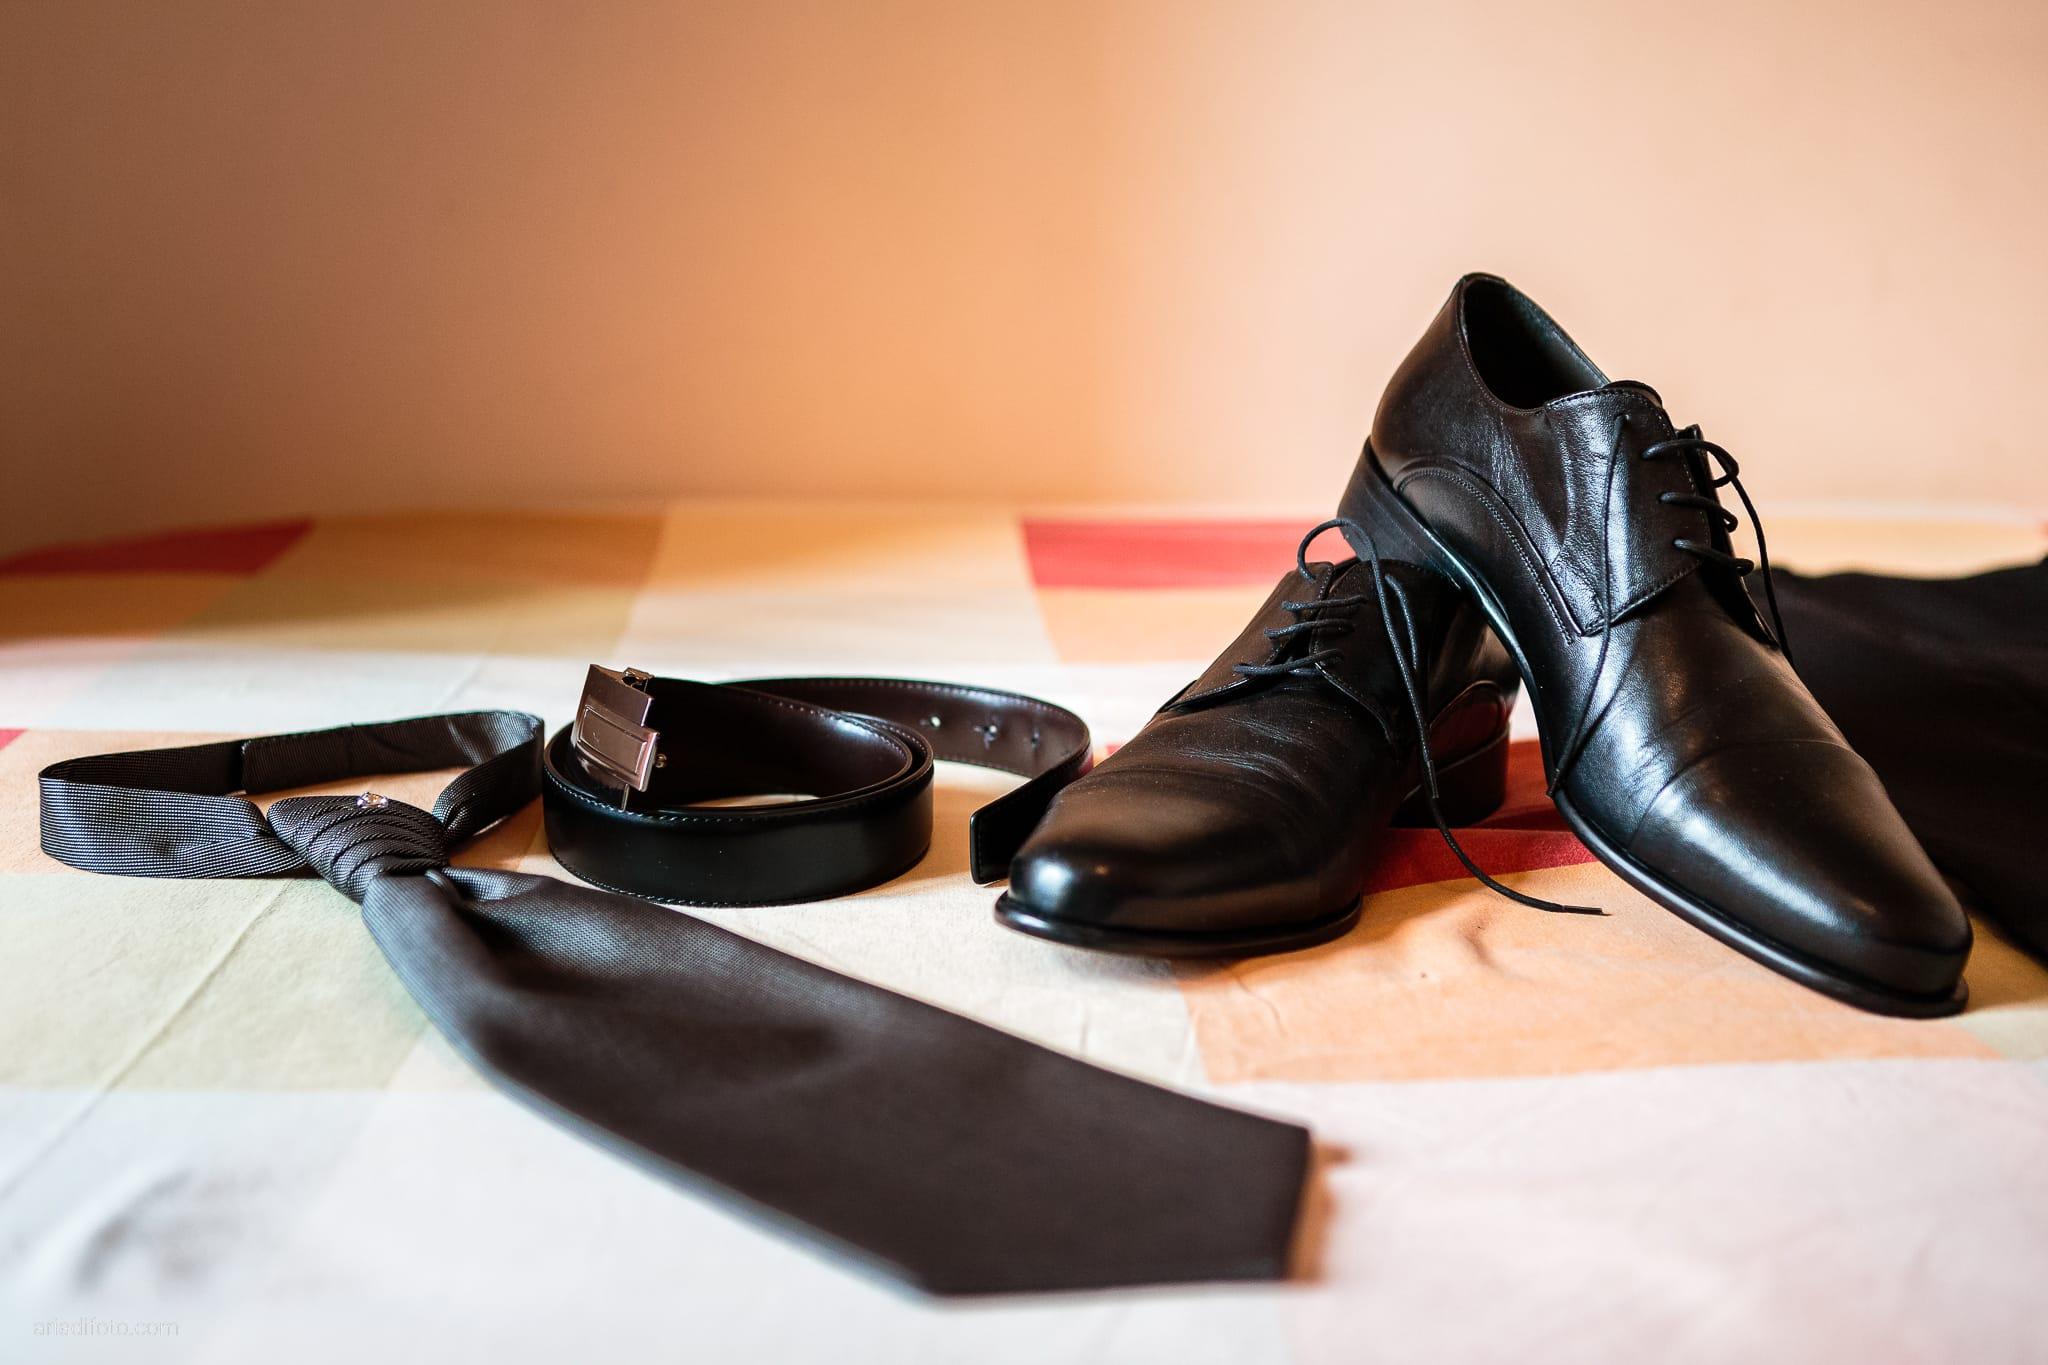 Fiordaliso Andrea matrimonio Salvia Rosmarino Trieste preparativi dettagli cravatta scarpe cintura